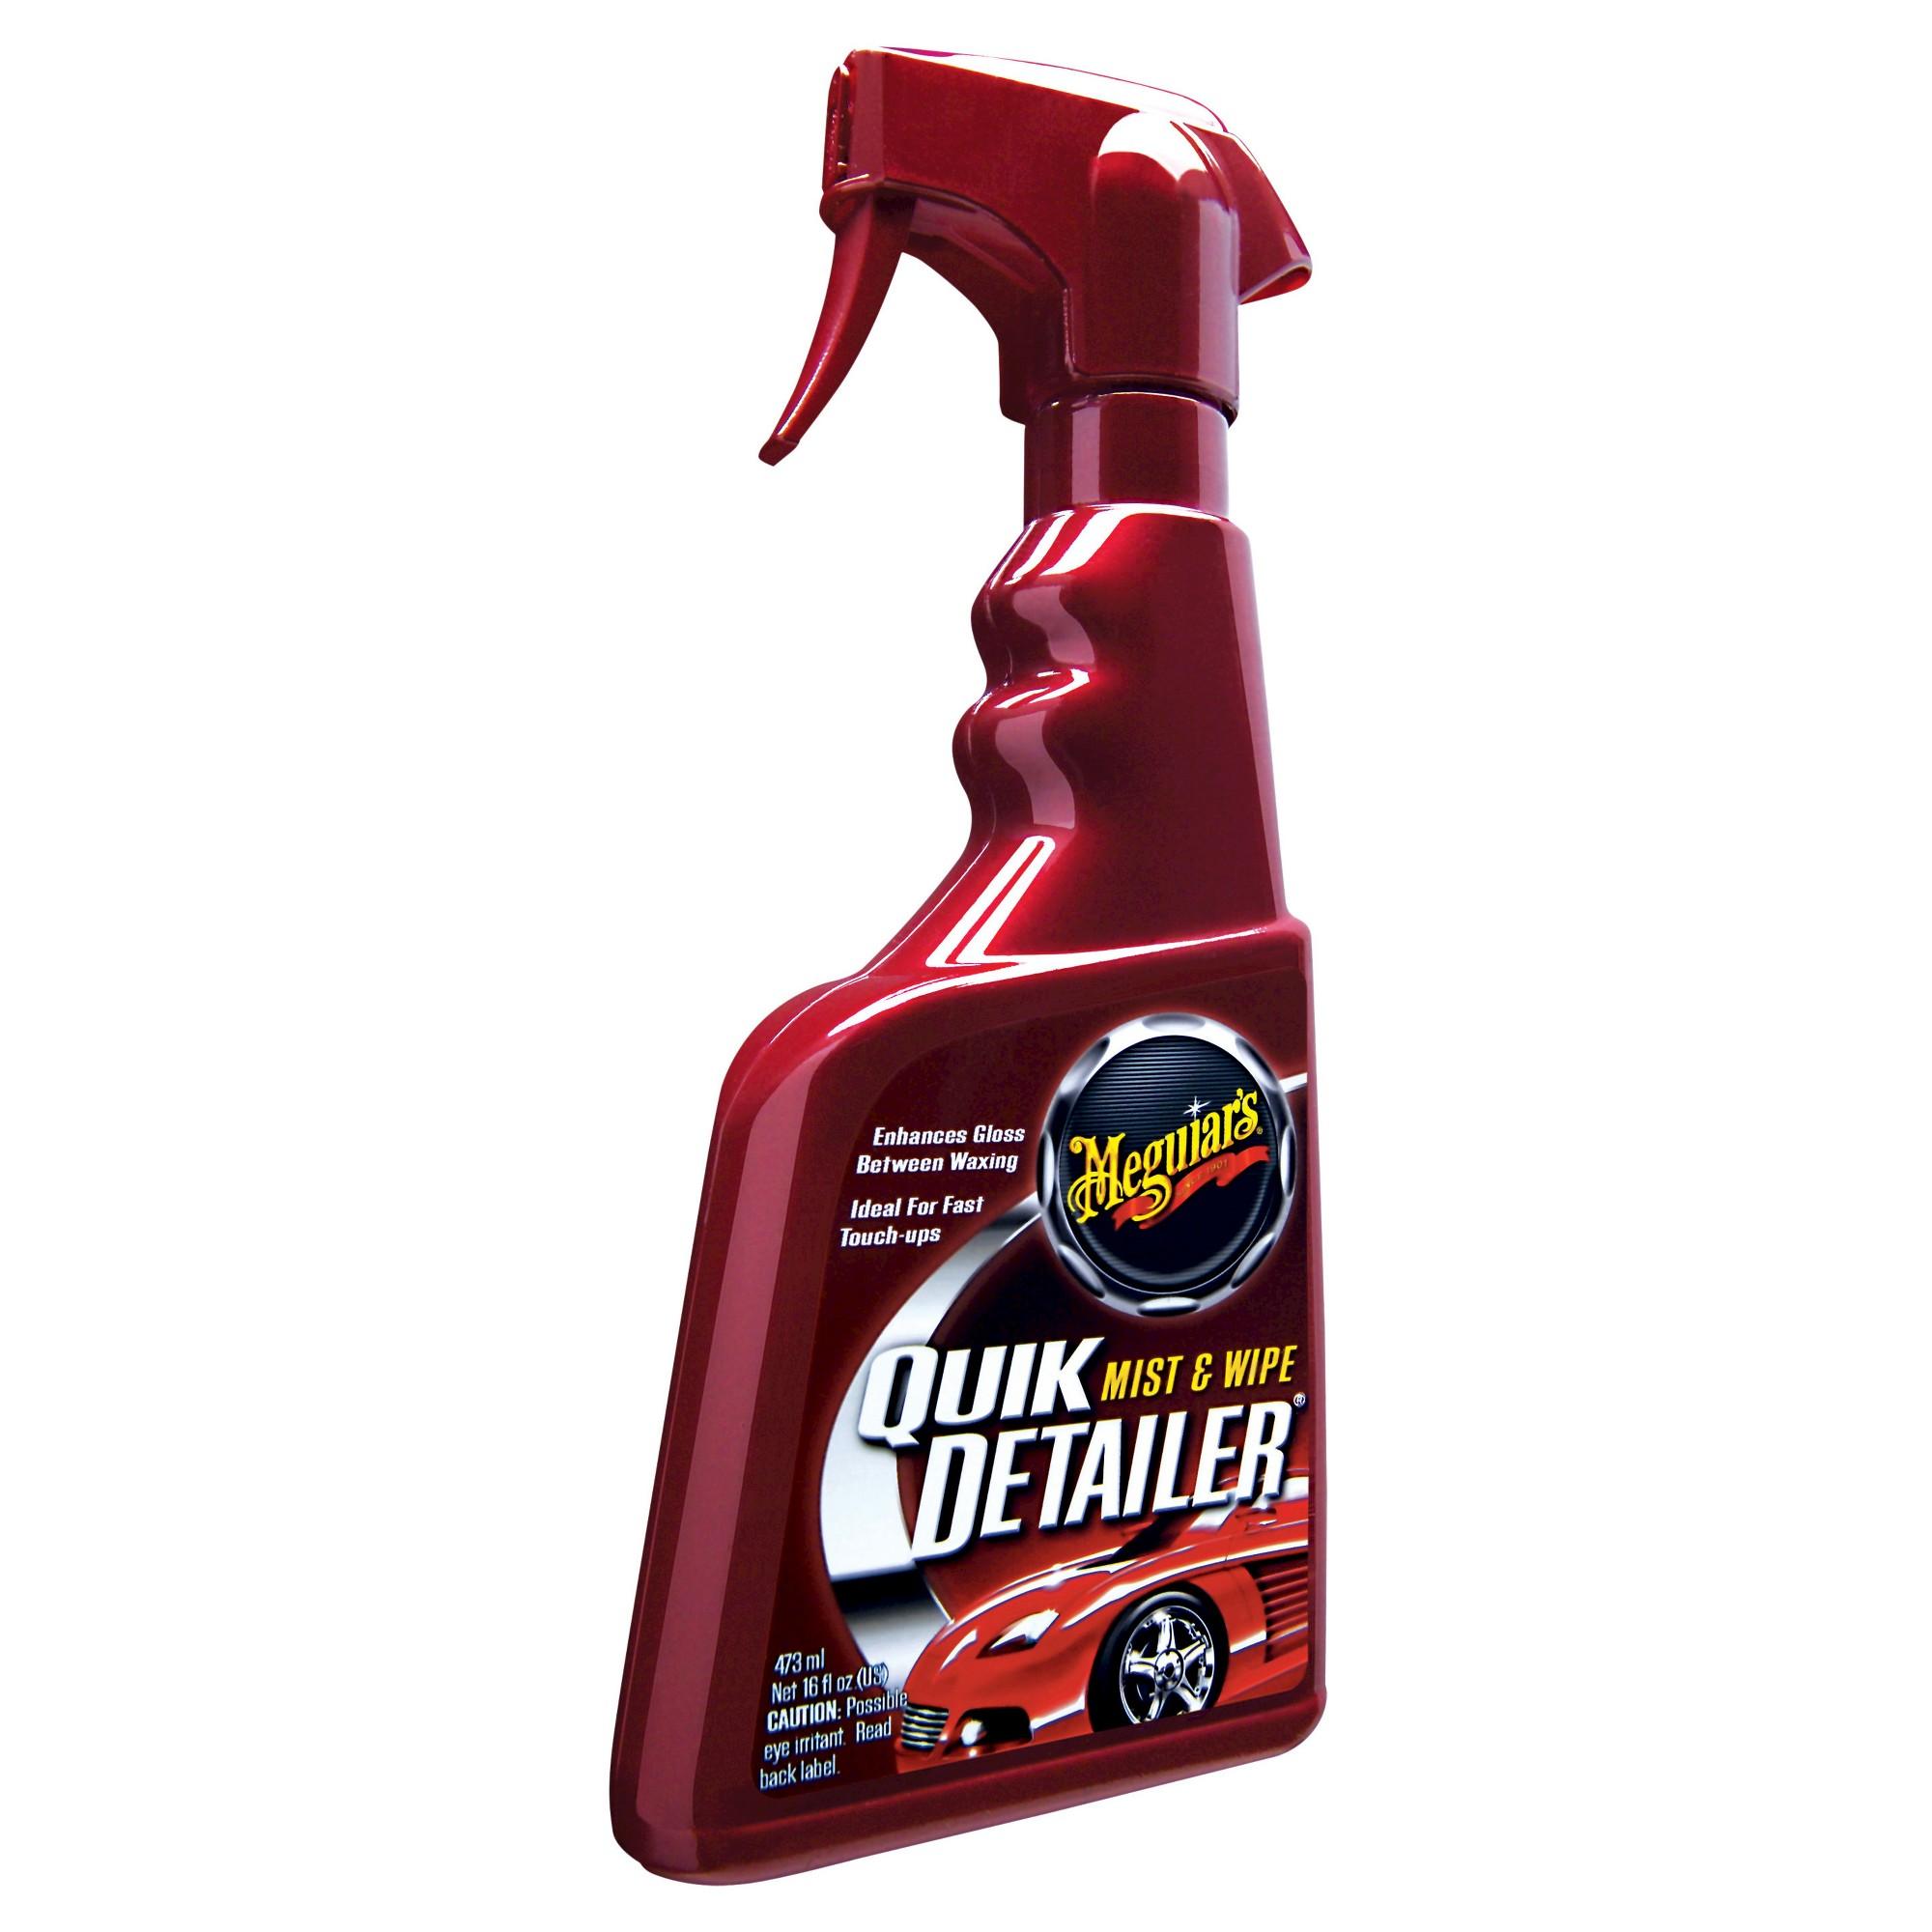 Meguiar S Quik Detailer Cleaner 16 Oz Wax Car Wash Spray Bottle